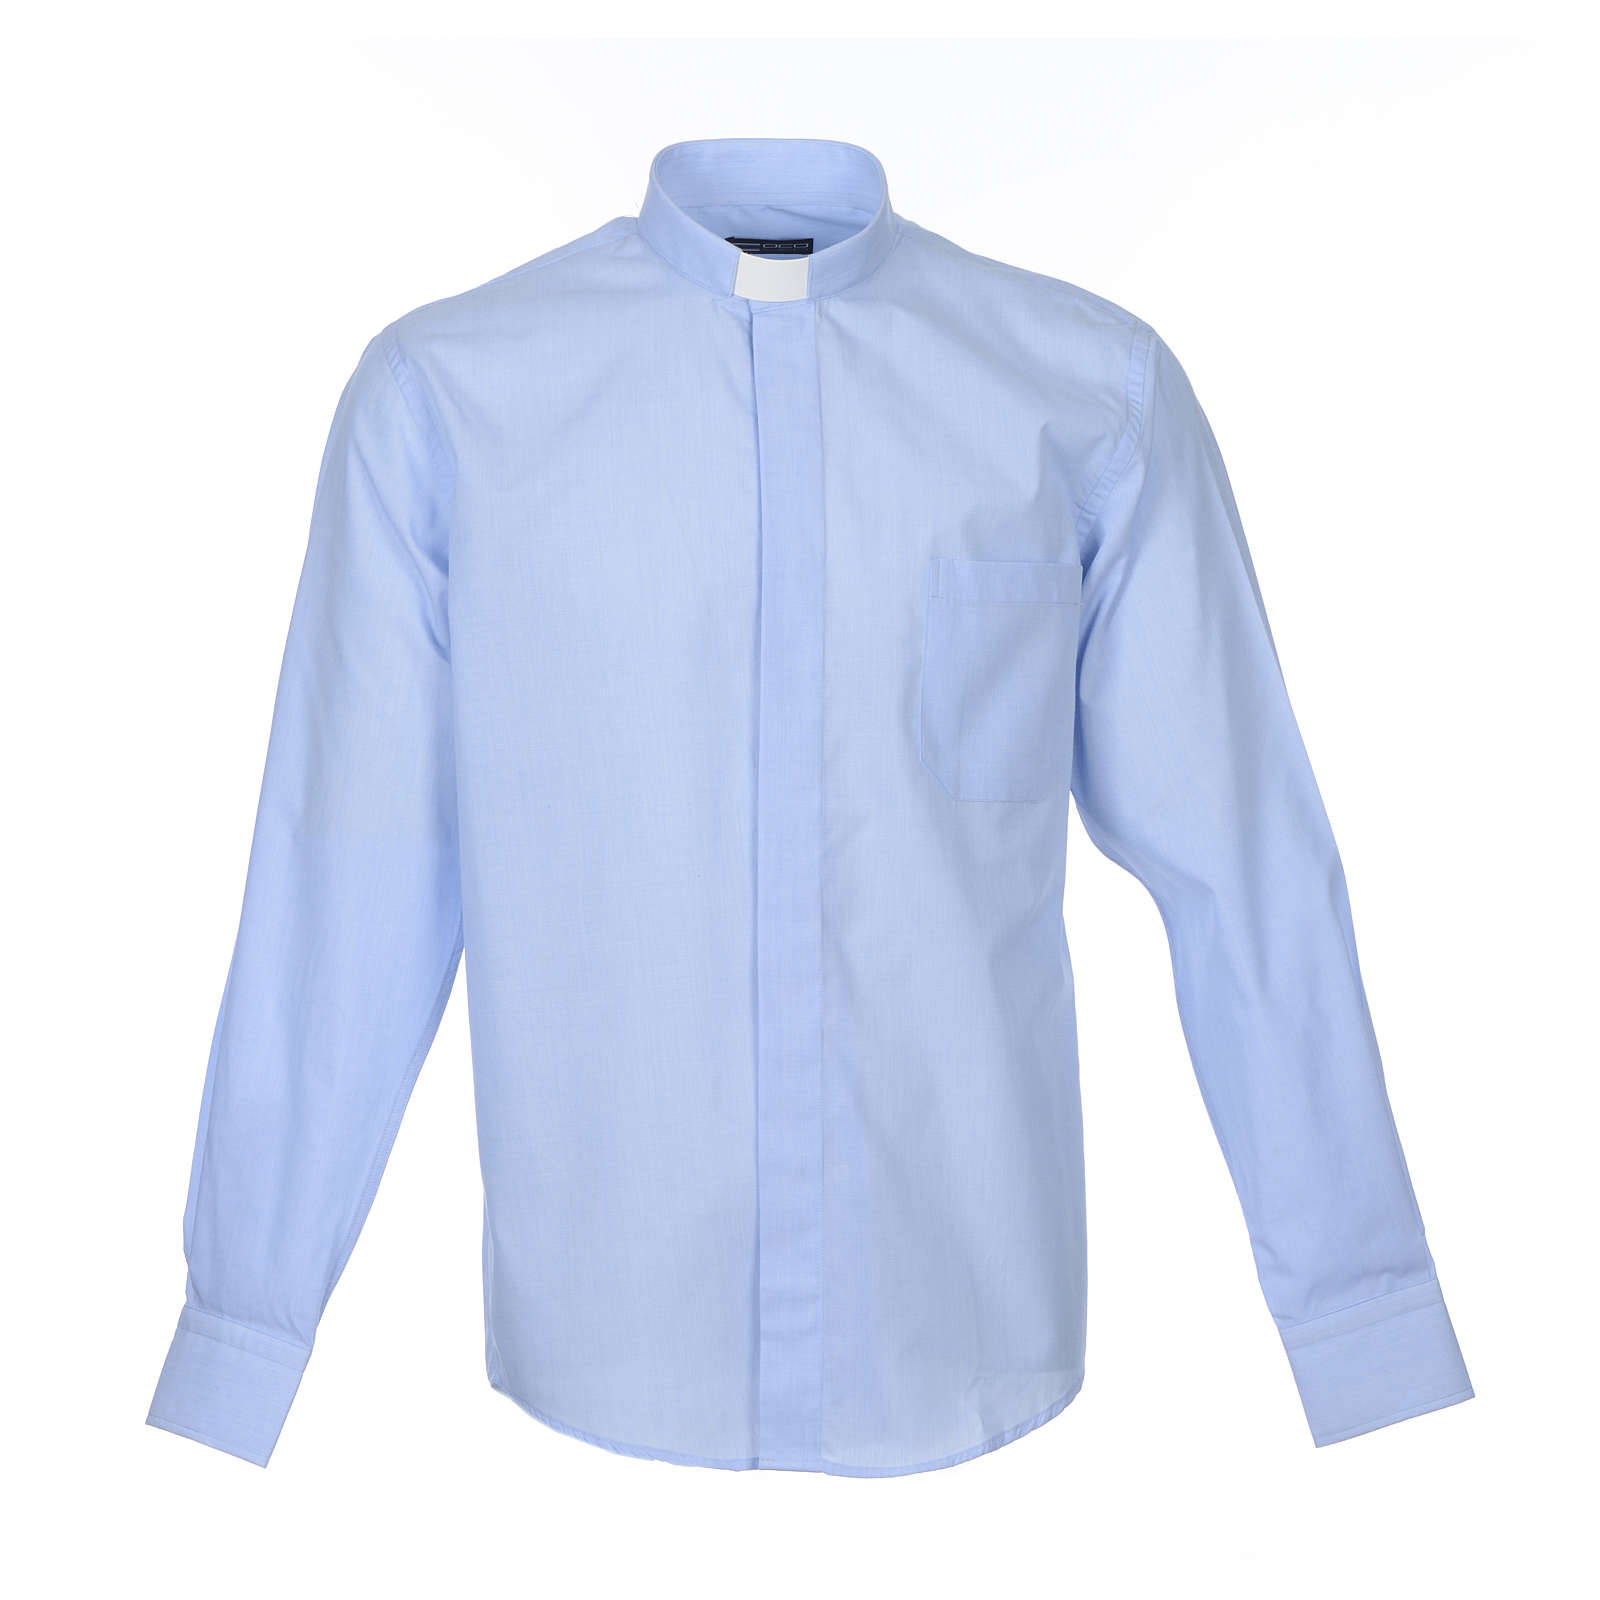 Camisa clergy M/L filafil misto algodão azul claro  4